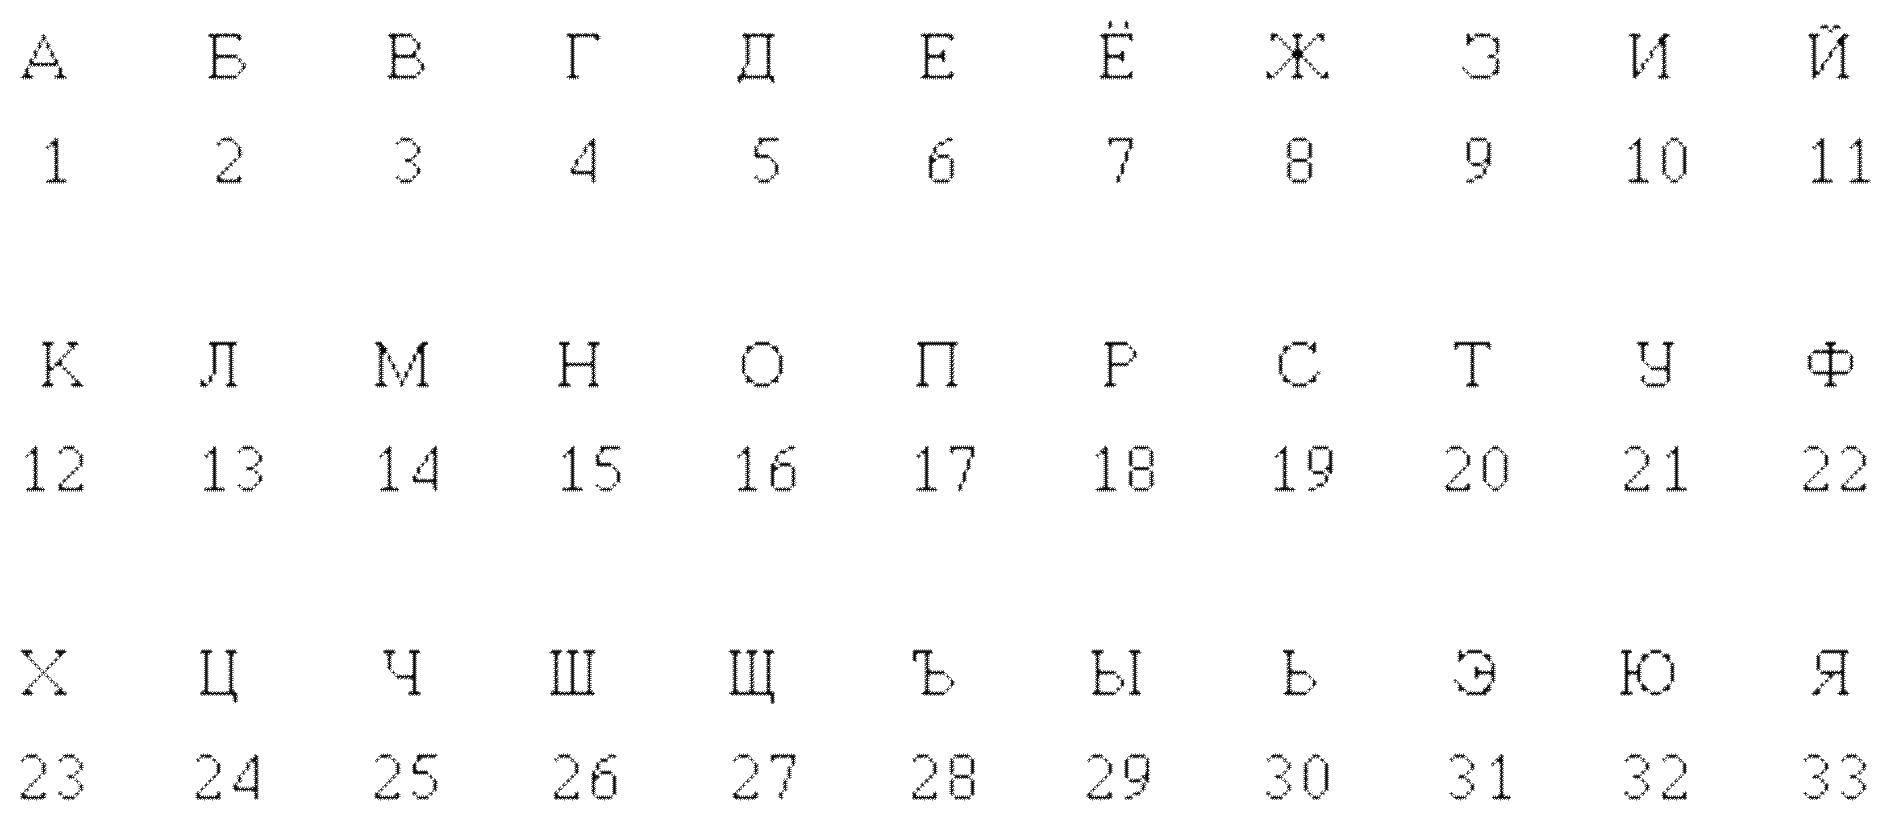 Раскраска Буквы цифры Скачать алфавит, цифры.  Распечатать ,буквы,